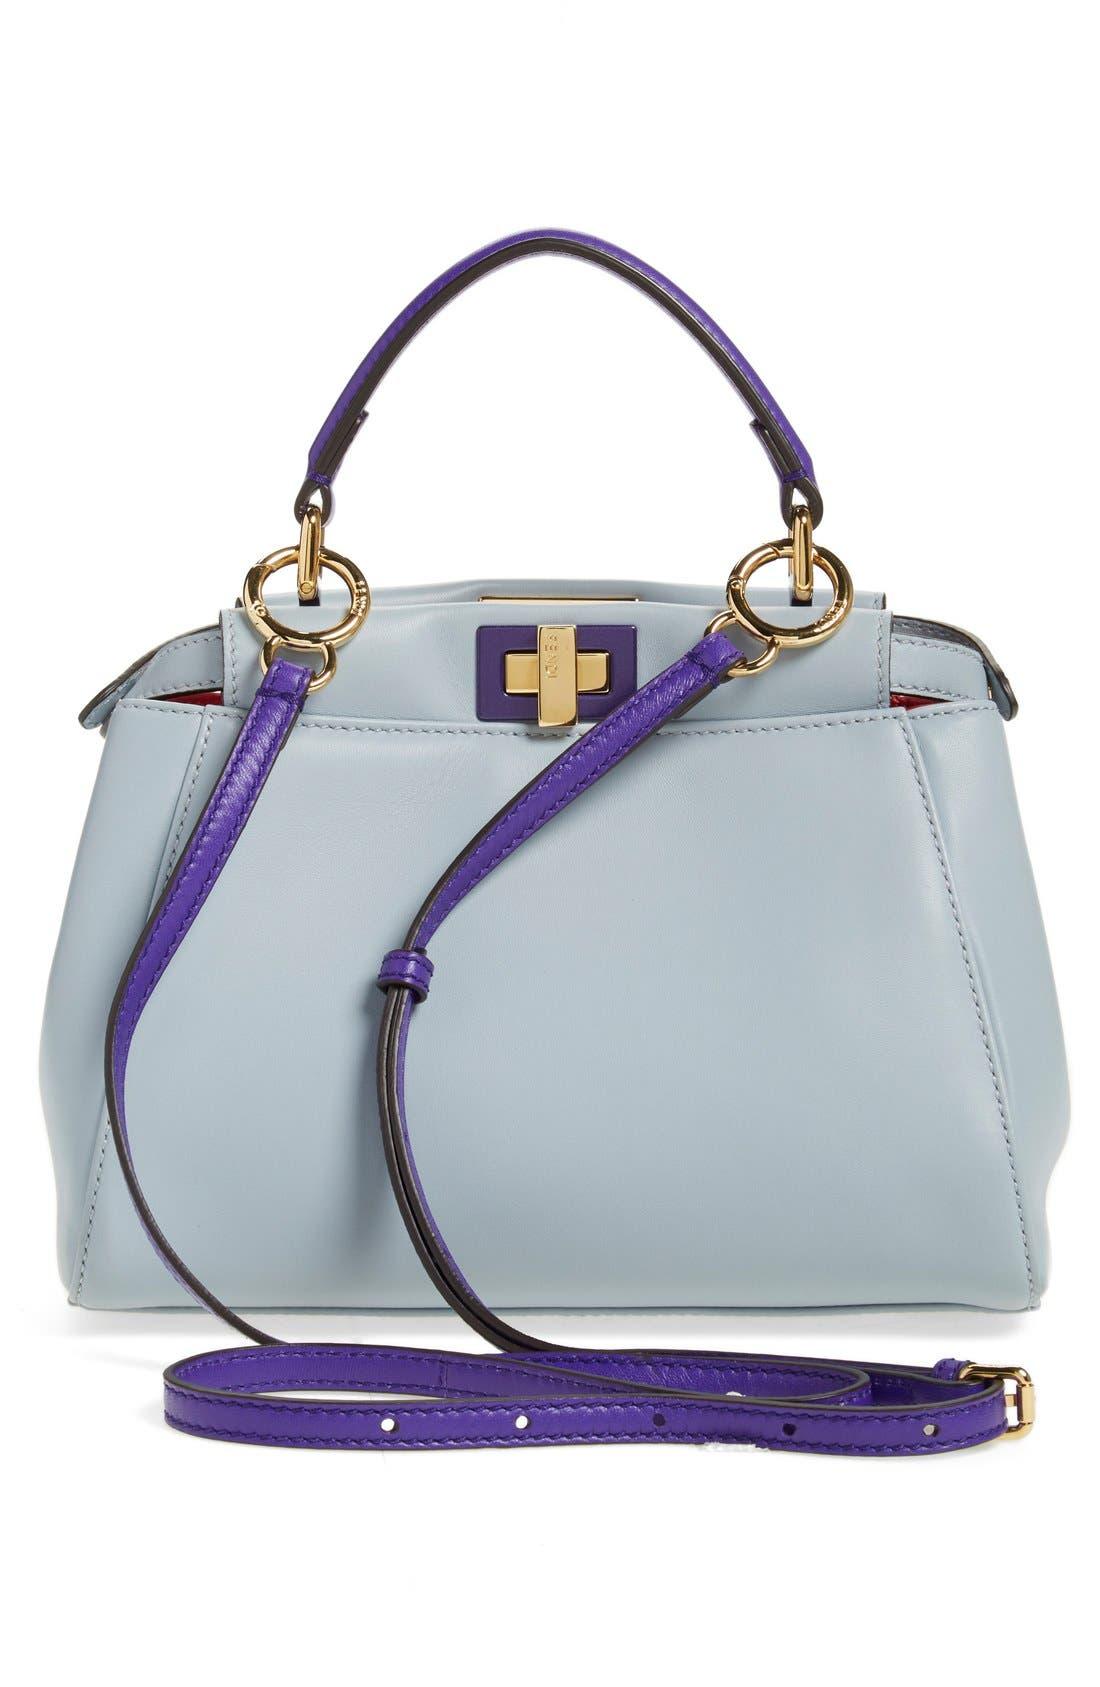 'Mini Peekaboo' Colorblock Leather Bag,                             Main thumbnail 1, color,                             250